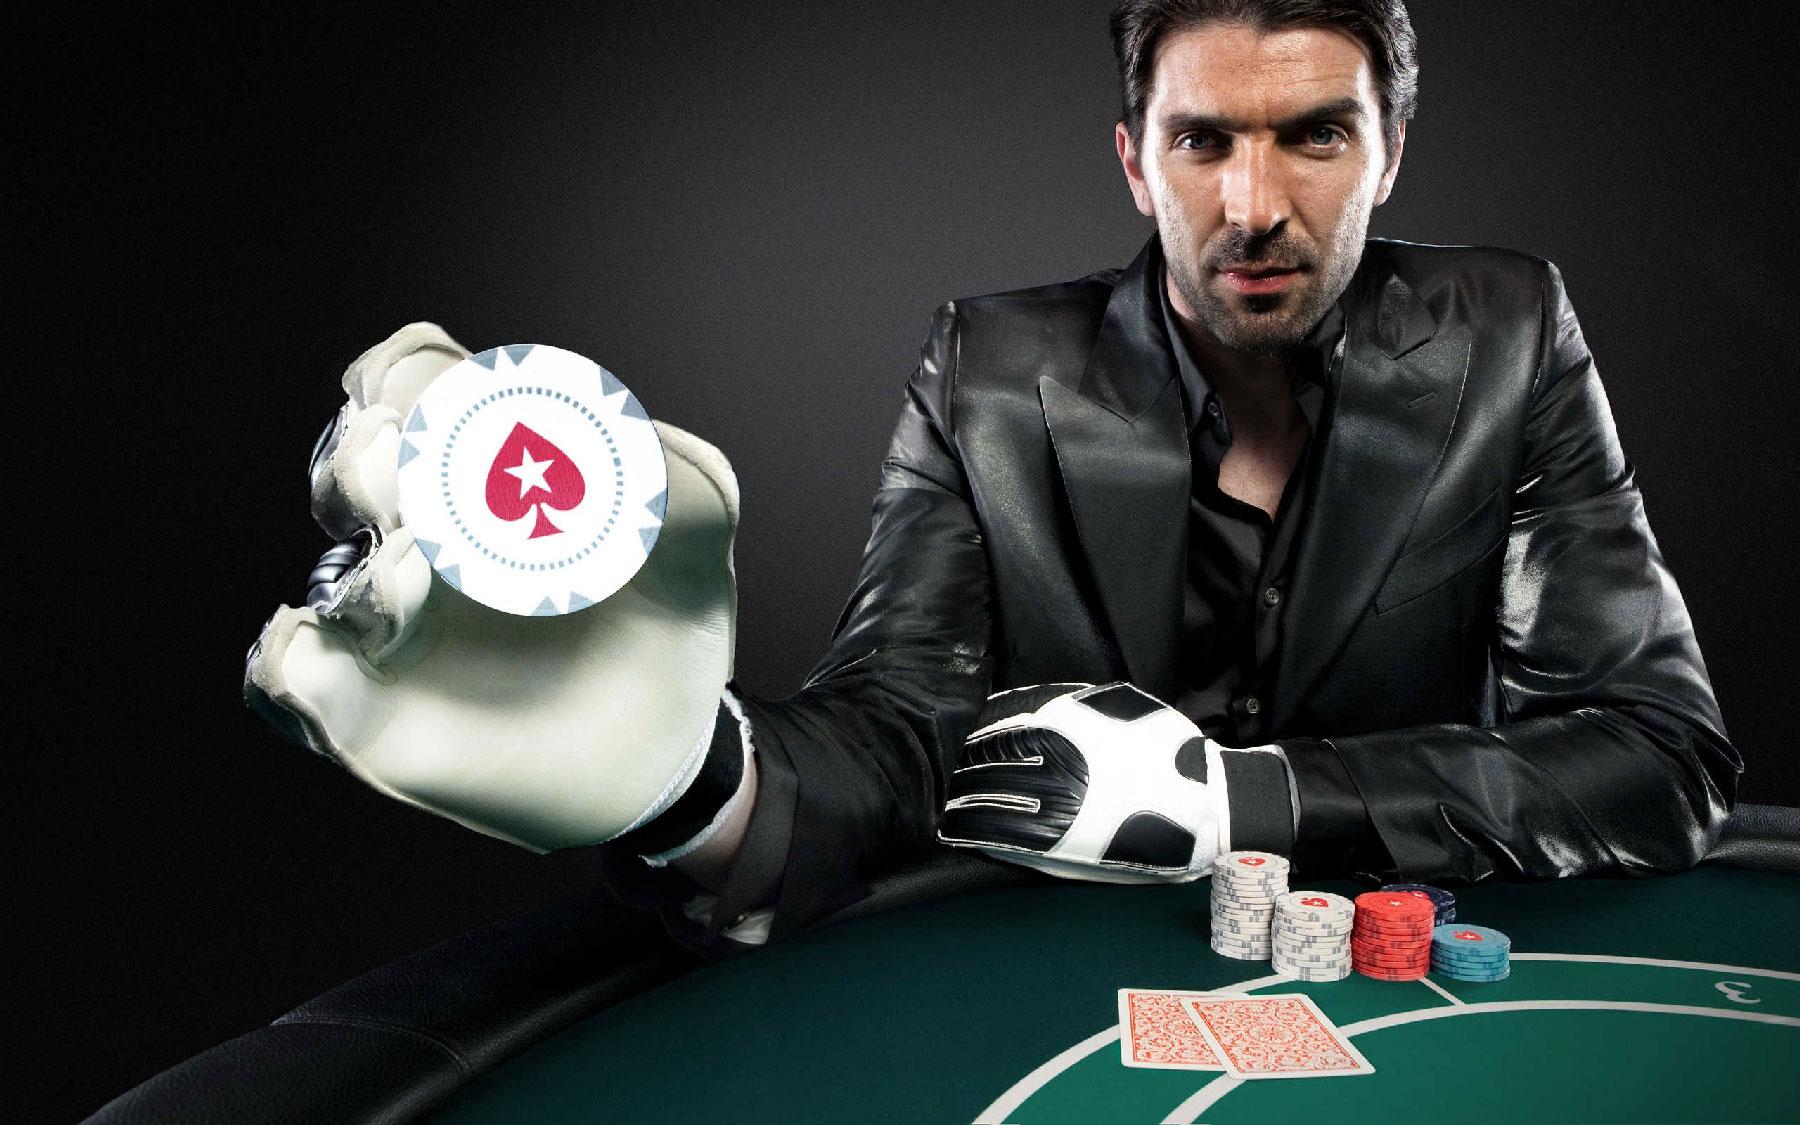 10 beste spelers op PokerStars